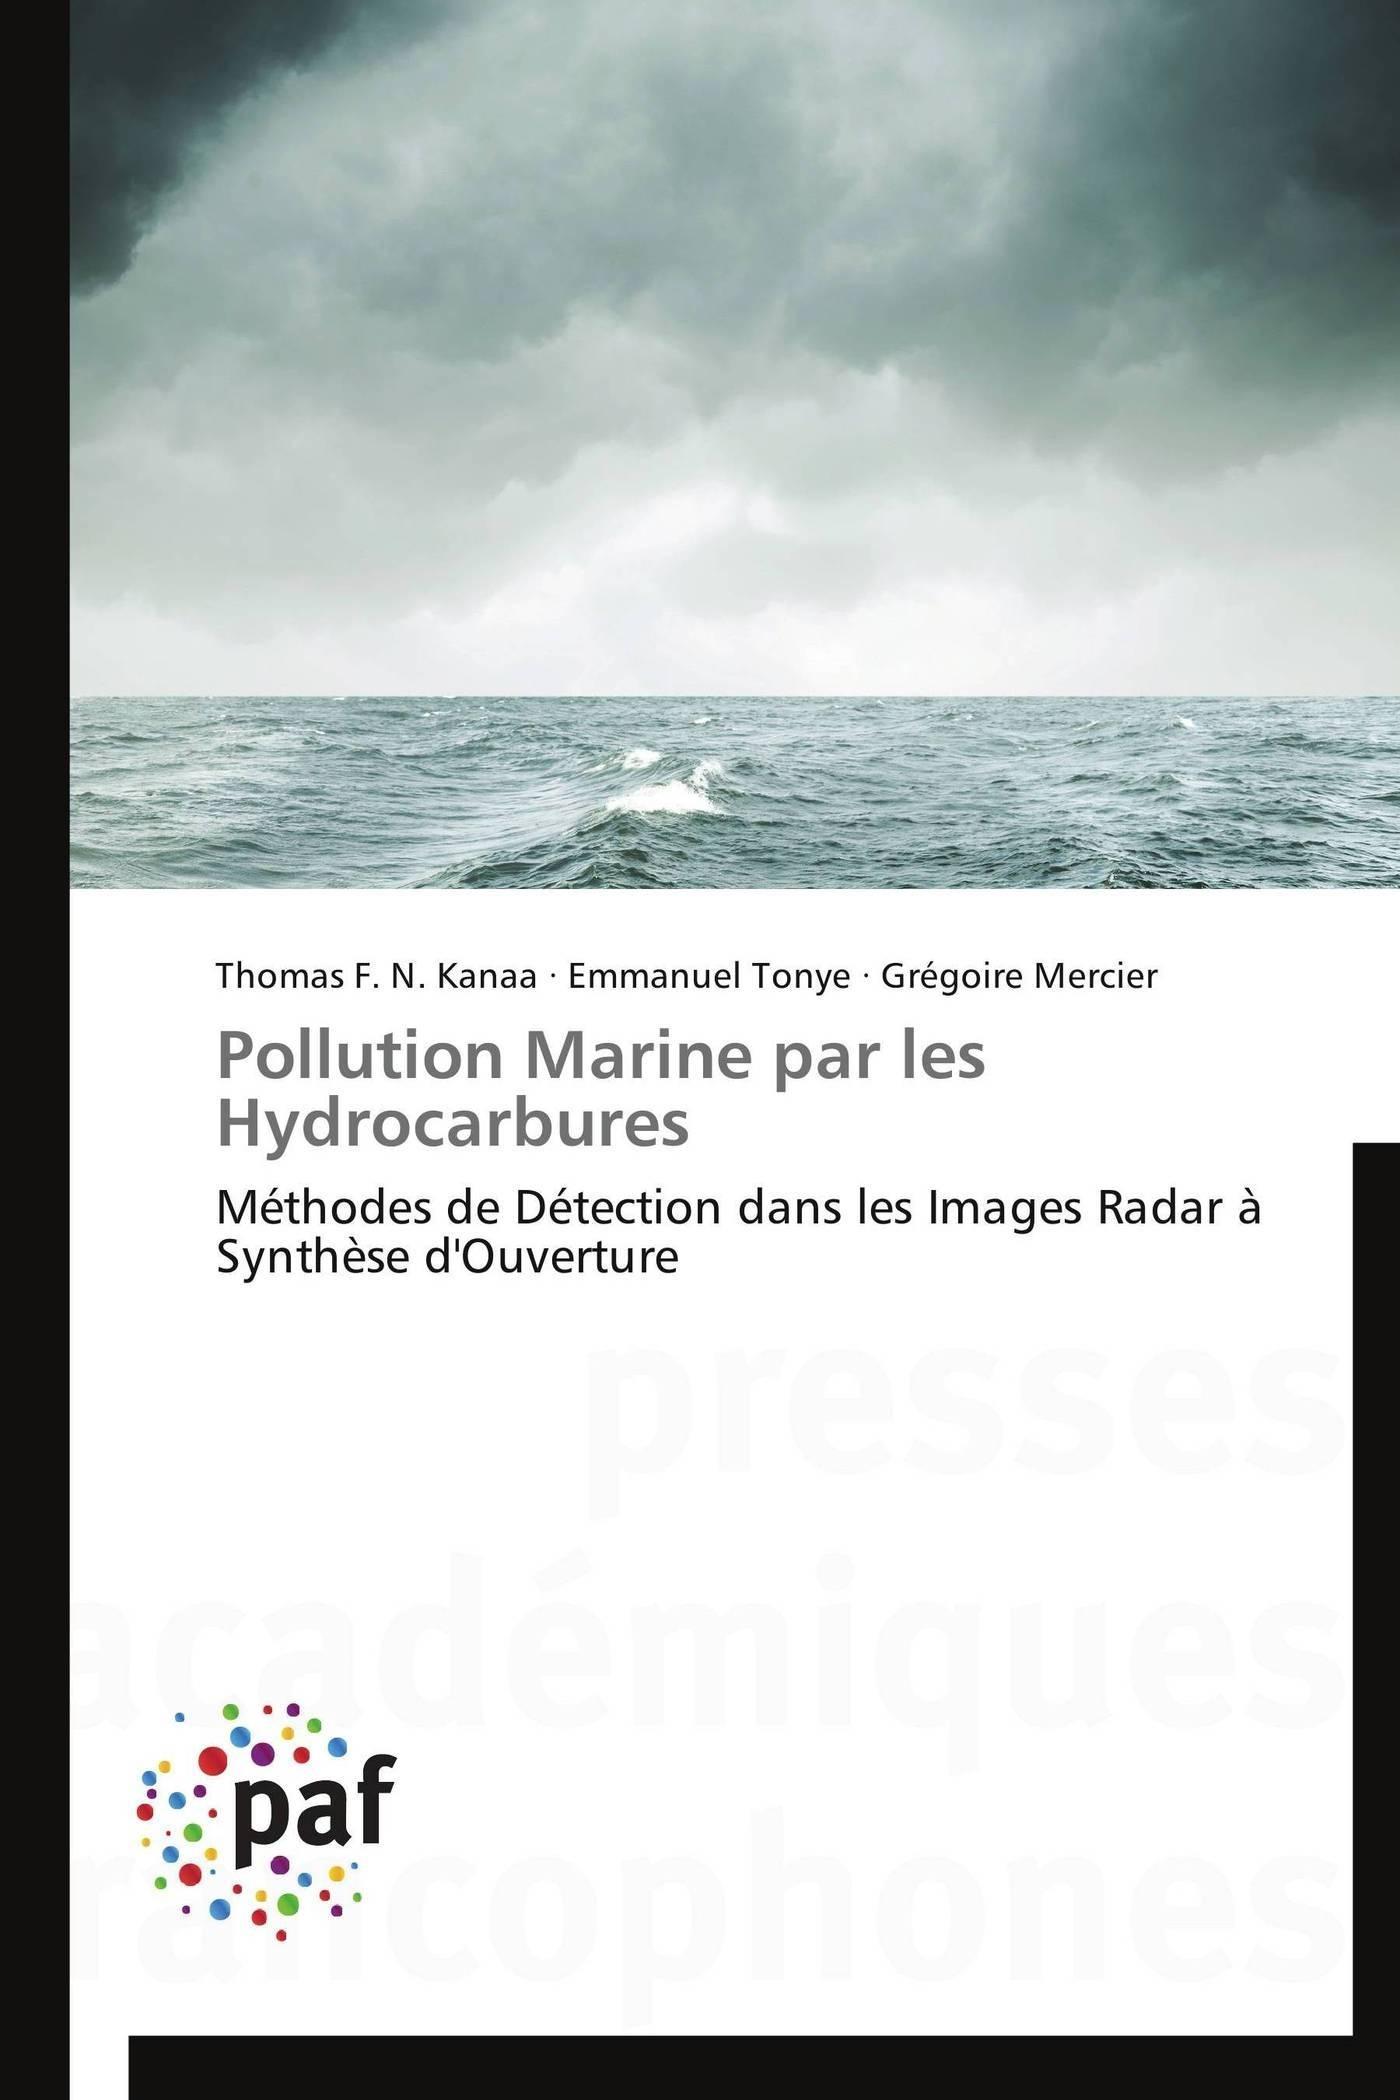 POLLUTION MARINE PAR LES HYDROCARBURES